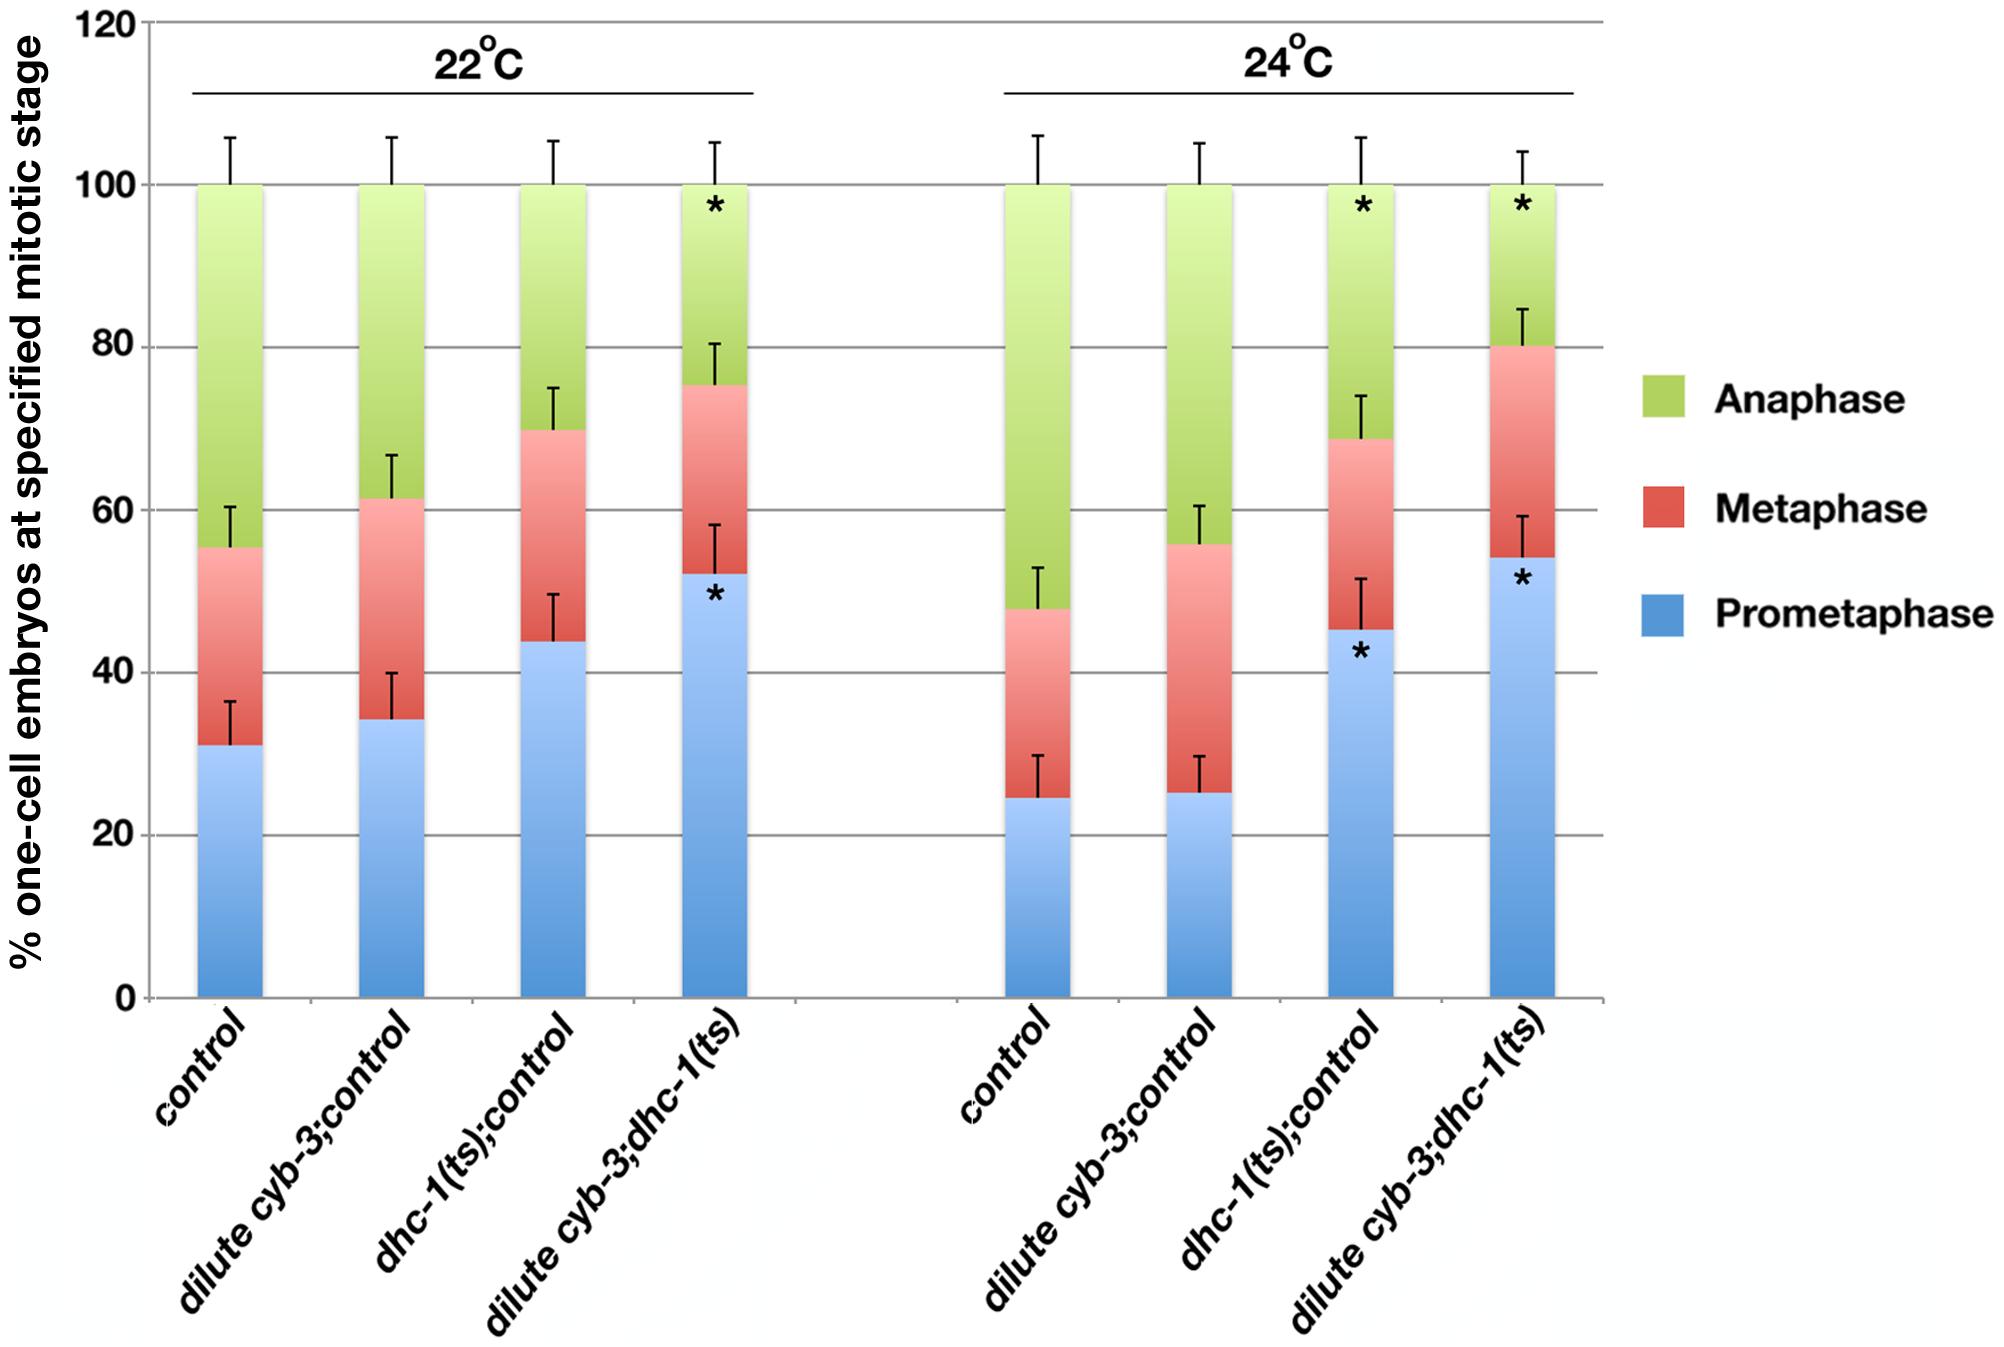 Inhibition of DHC-1 enhances cell cycle progression delays in <i>cyb-3(RNAi)</i> embryos.